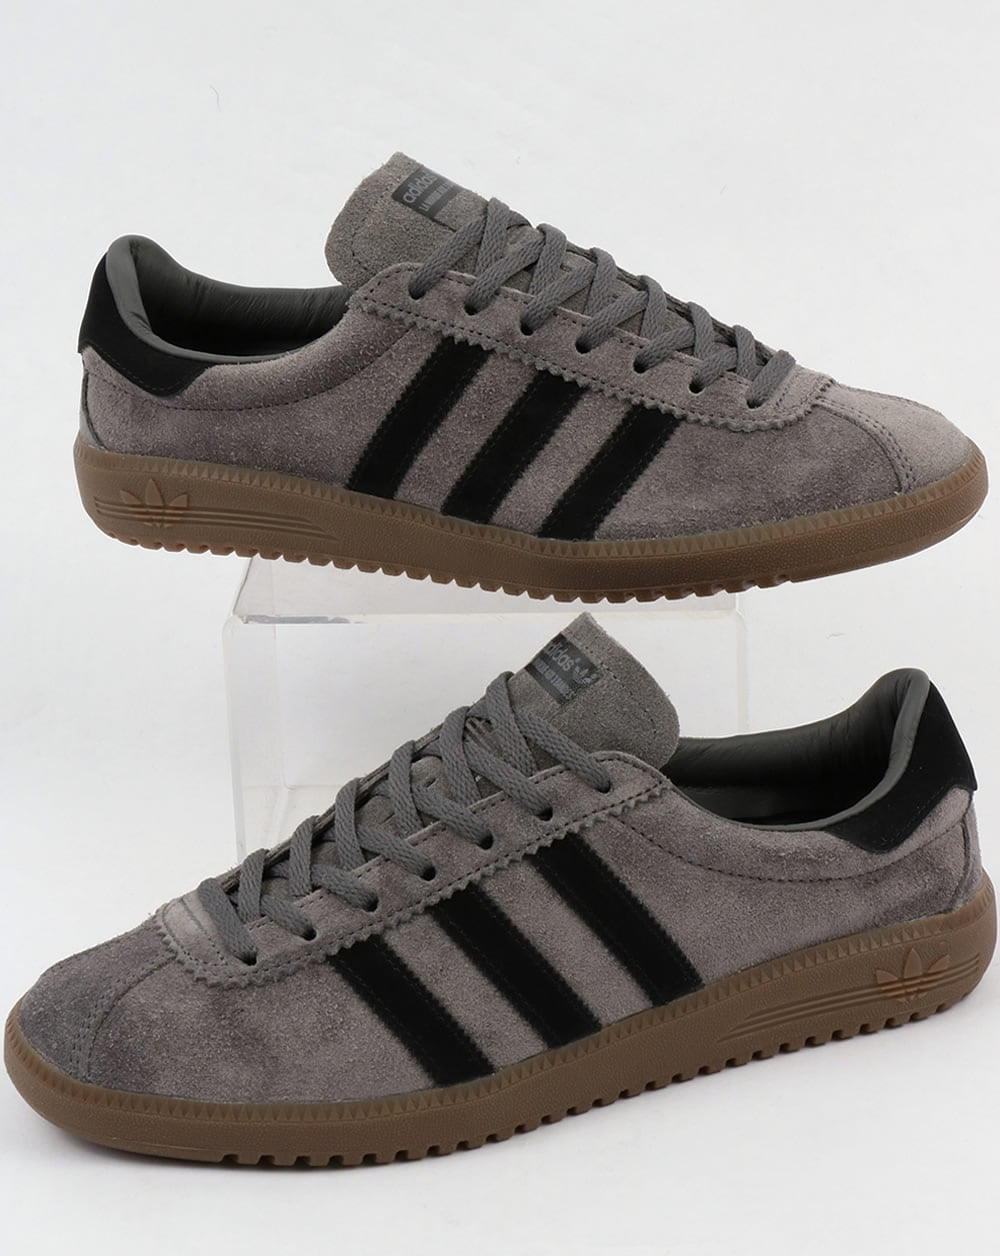 Kangol Shoes Uk